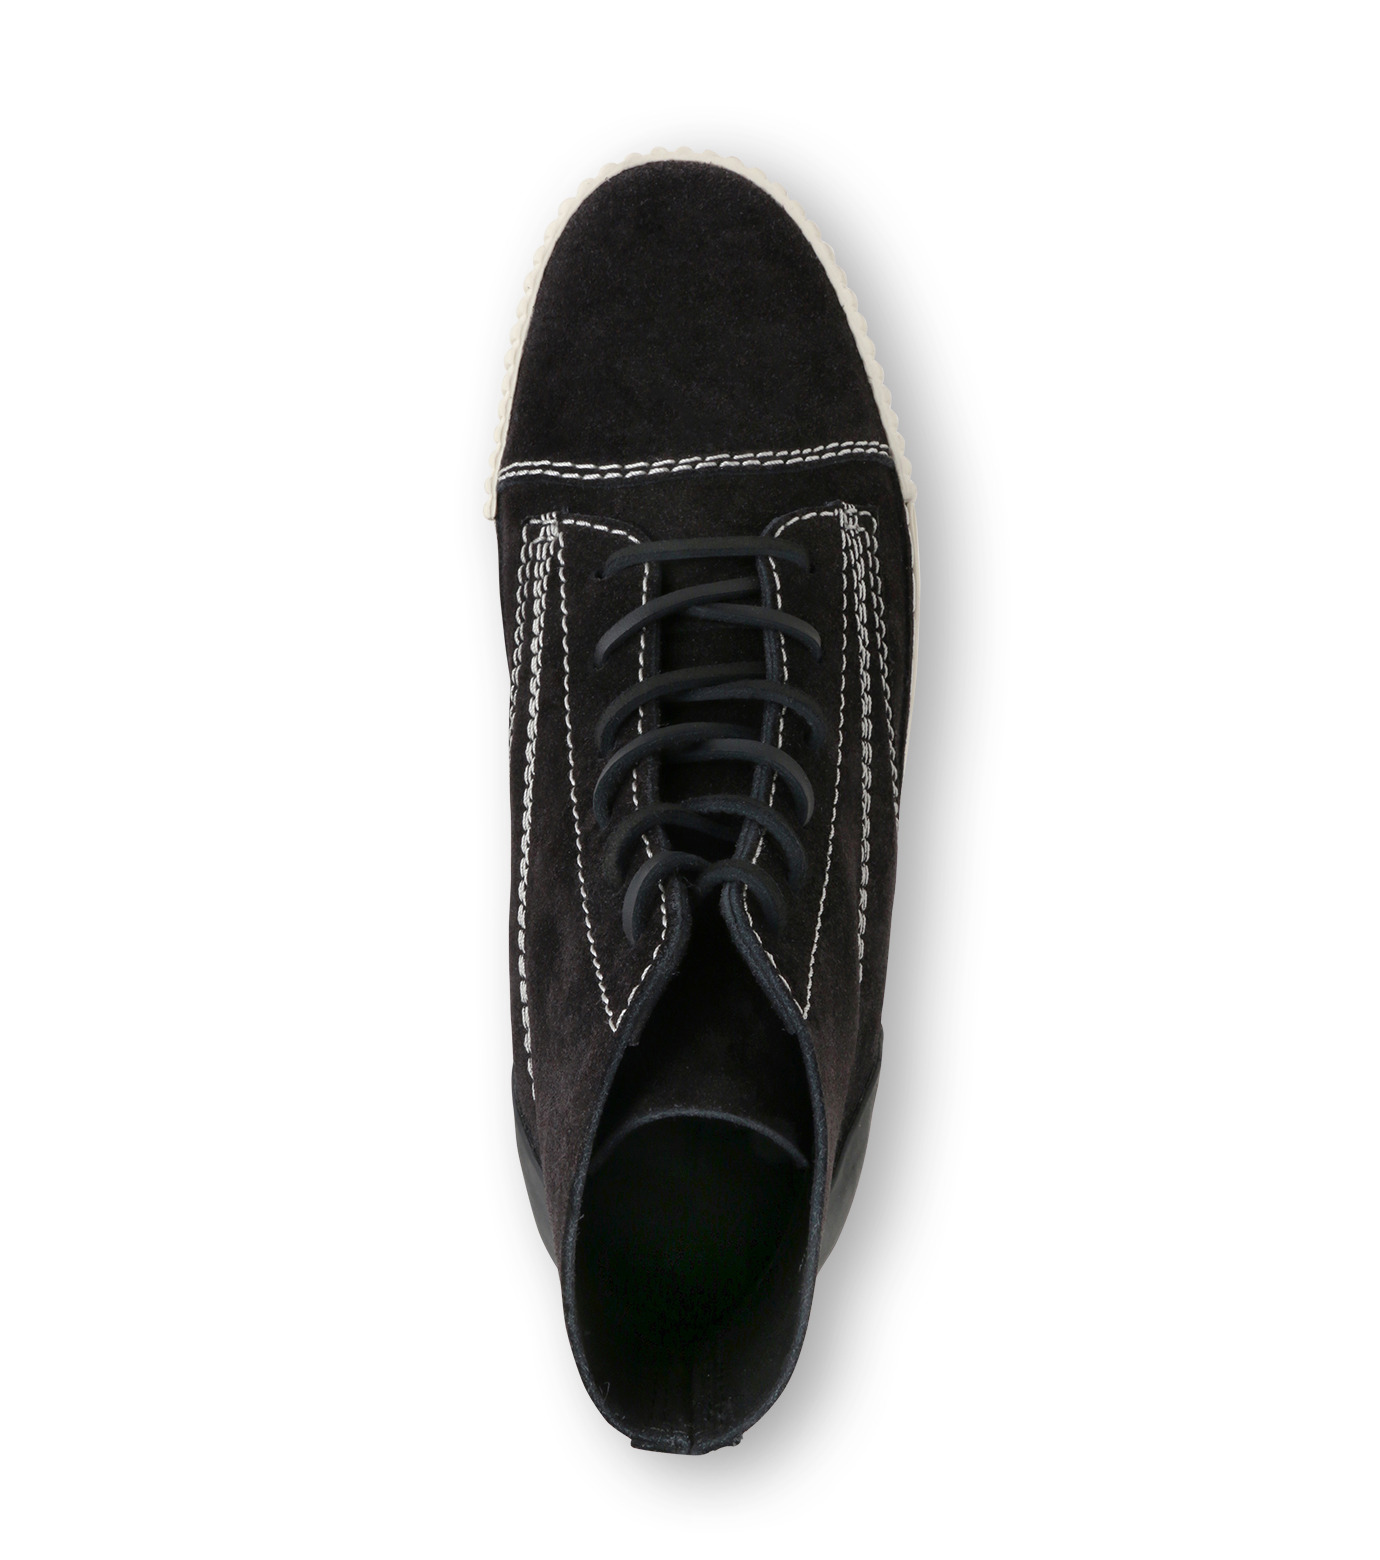 Alexander Wang(アレキサンダーワン)のHicut Sneaker-BLACK(スニーカー/sneaker)-315122F16-13 拡大詳細画像4